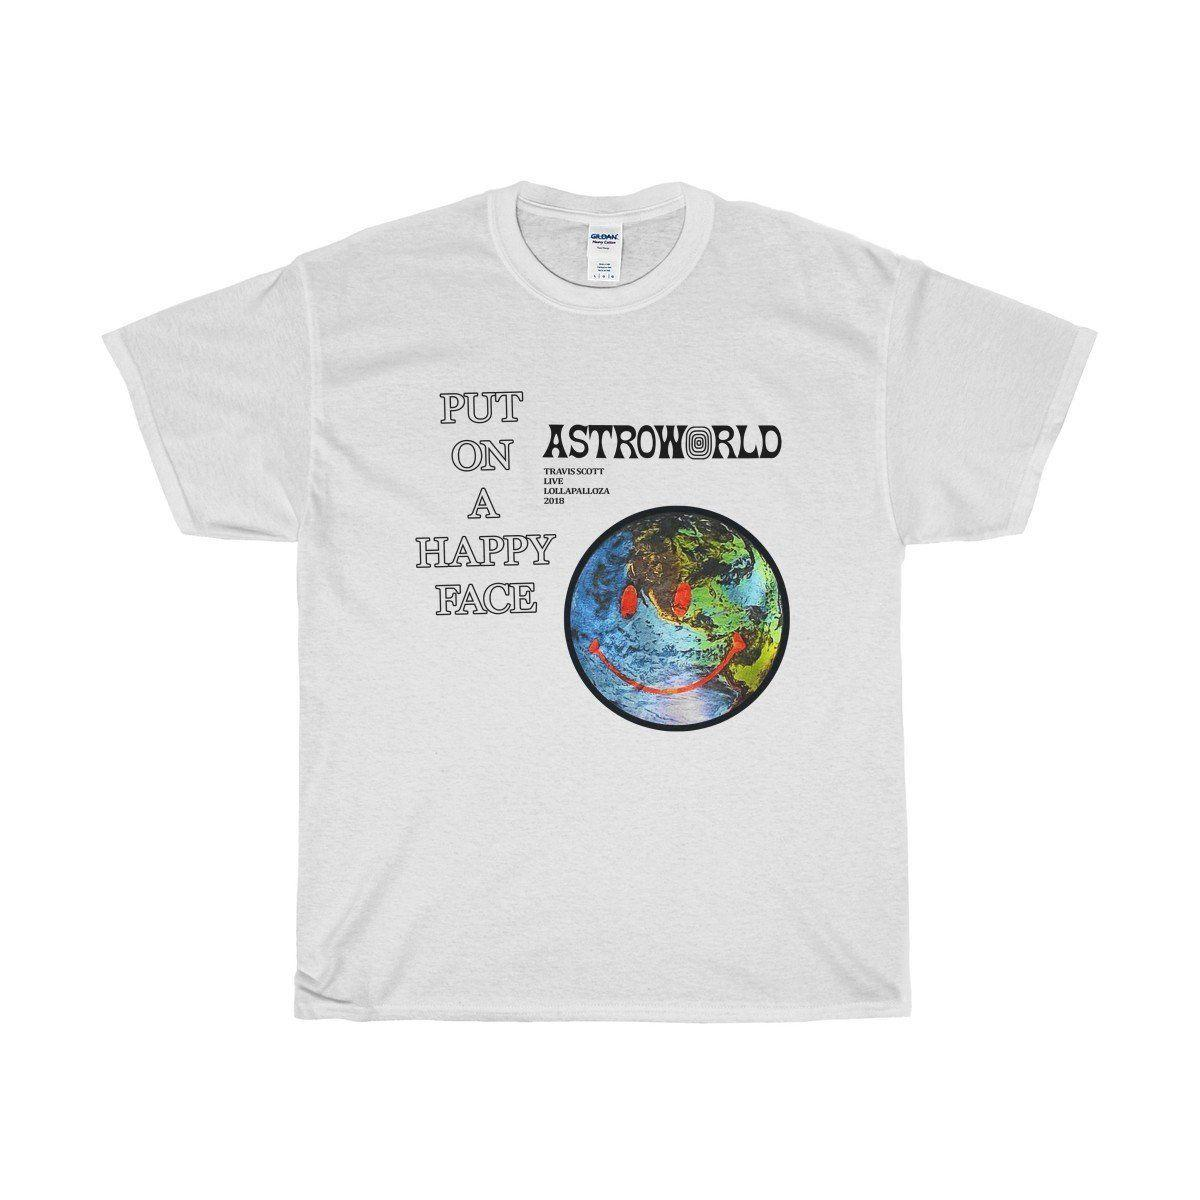 10885a609bf3 2018 Travis Scott Astroworld T Shirt 2 Sides Unisex 100% Cotton Tee White  Shirt Short Sleeve Shirt Novelty T Shirts From Nolifeshirt, $11.01   DHgate.Com